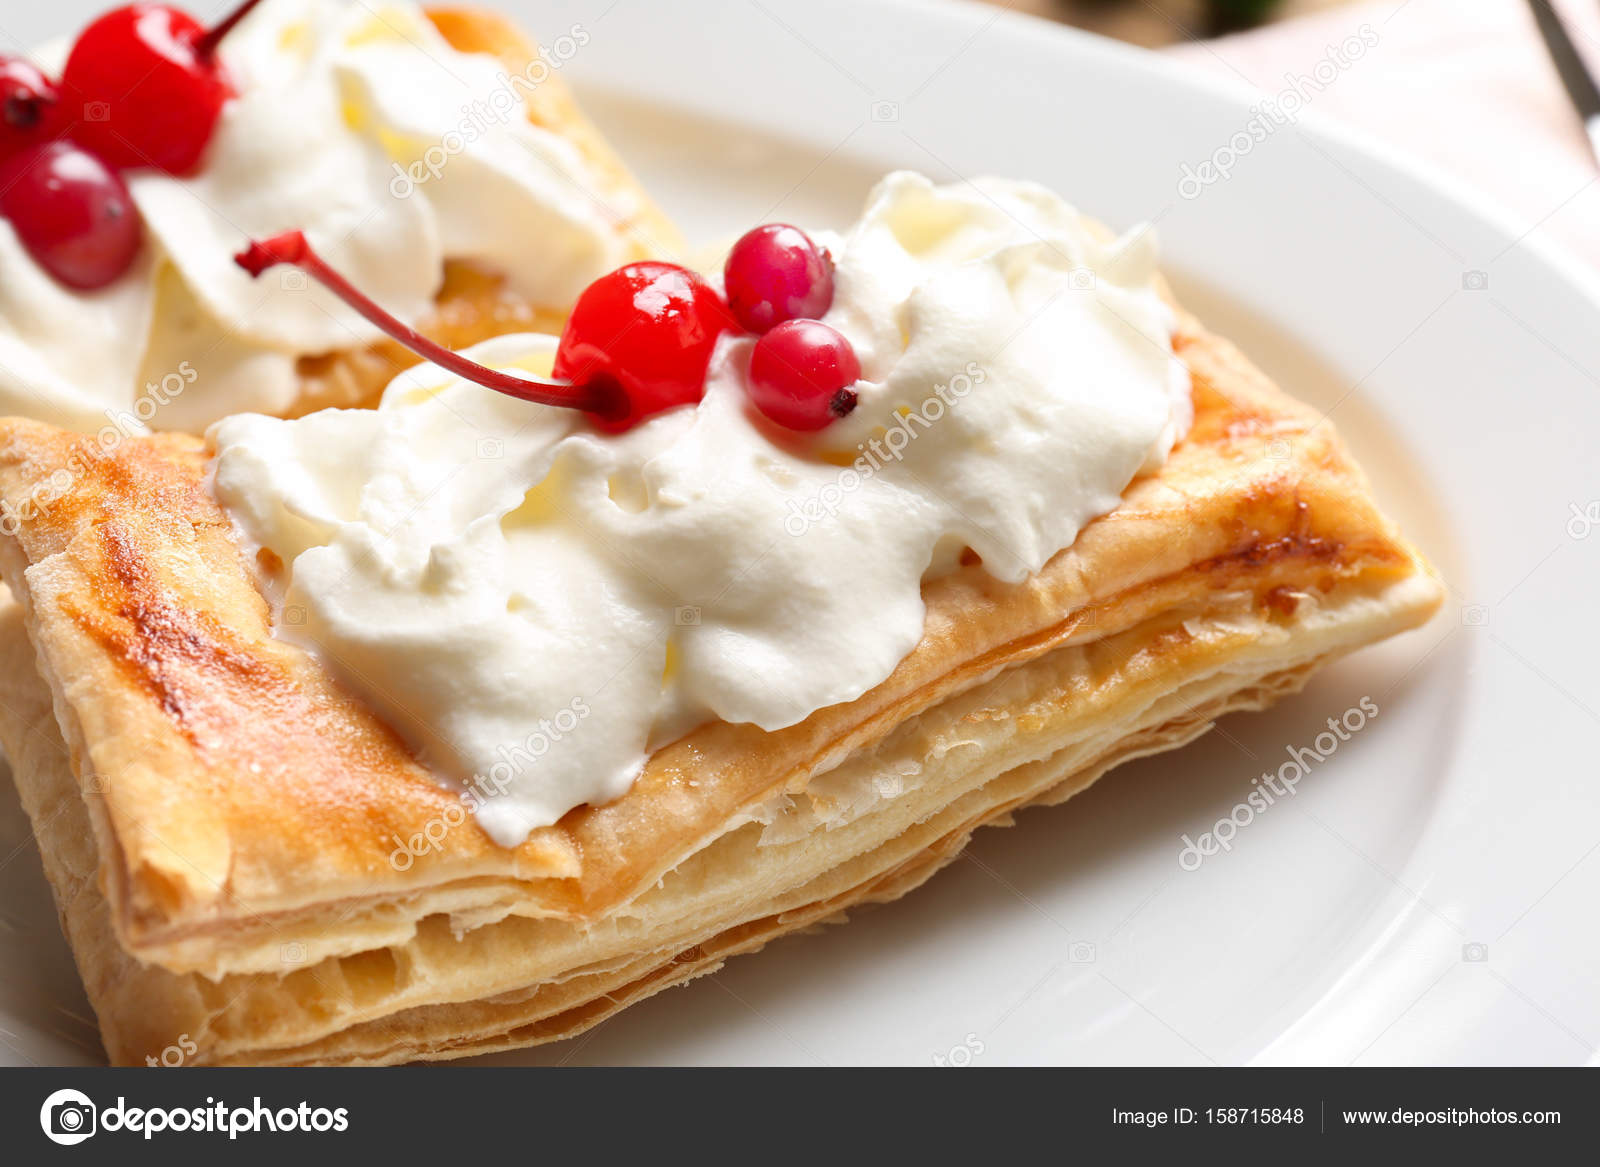 Smaczne Ciasto Francuskie Deser Z Jagodami I Bita Smietana Na